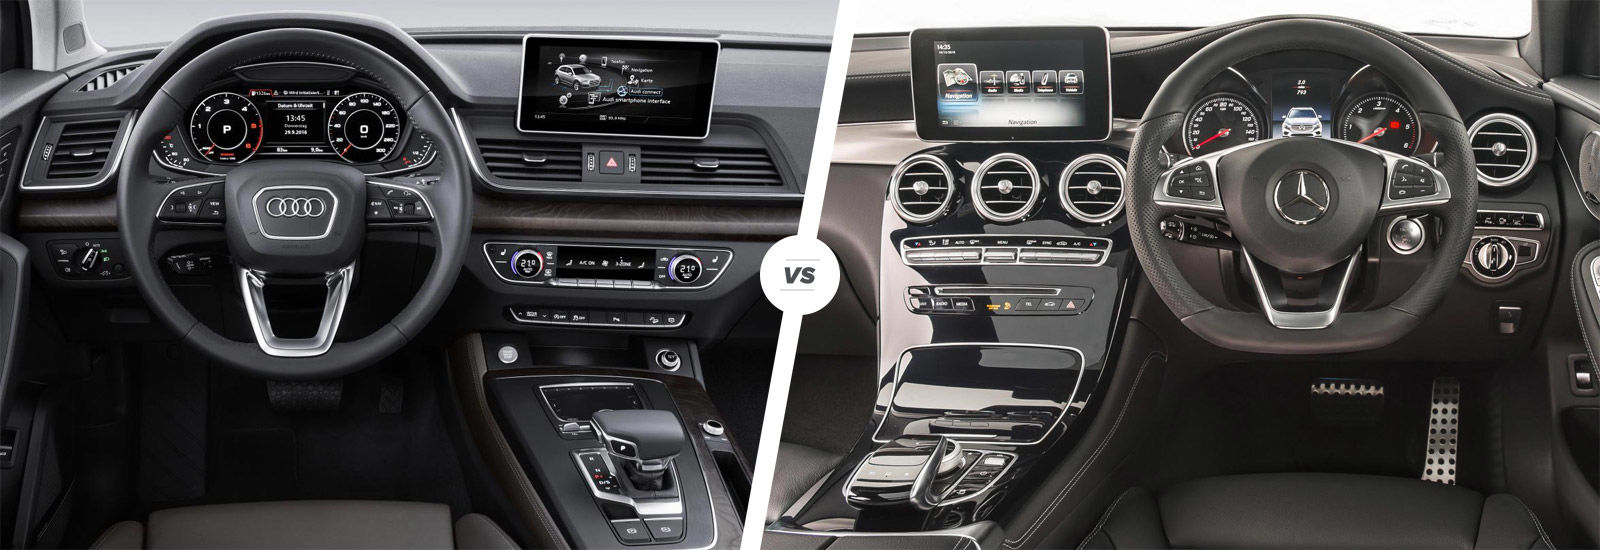 mercedes glc vs audi q5 suv comparison carwow. Black Bedroom Furniture Sets. Home Design Ideas